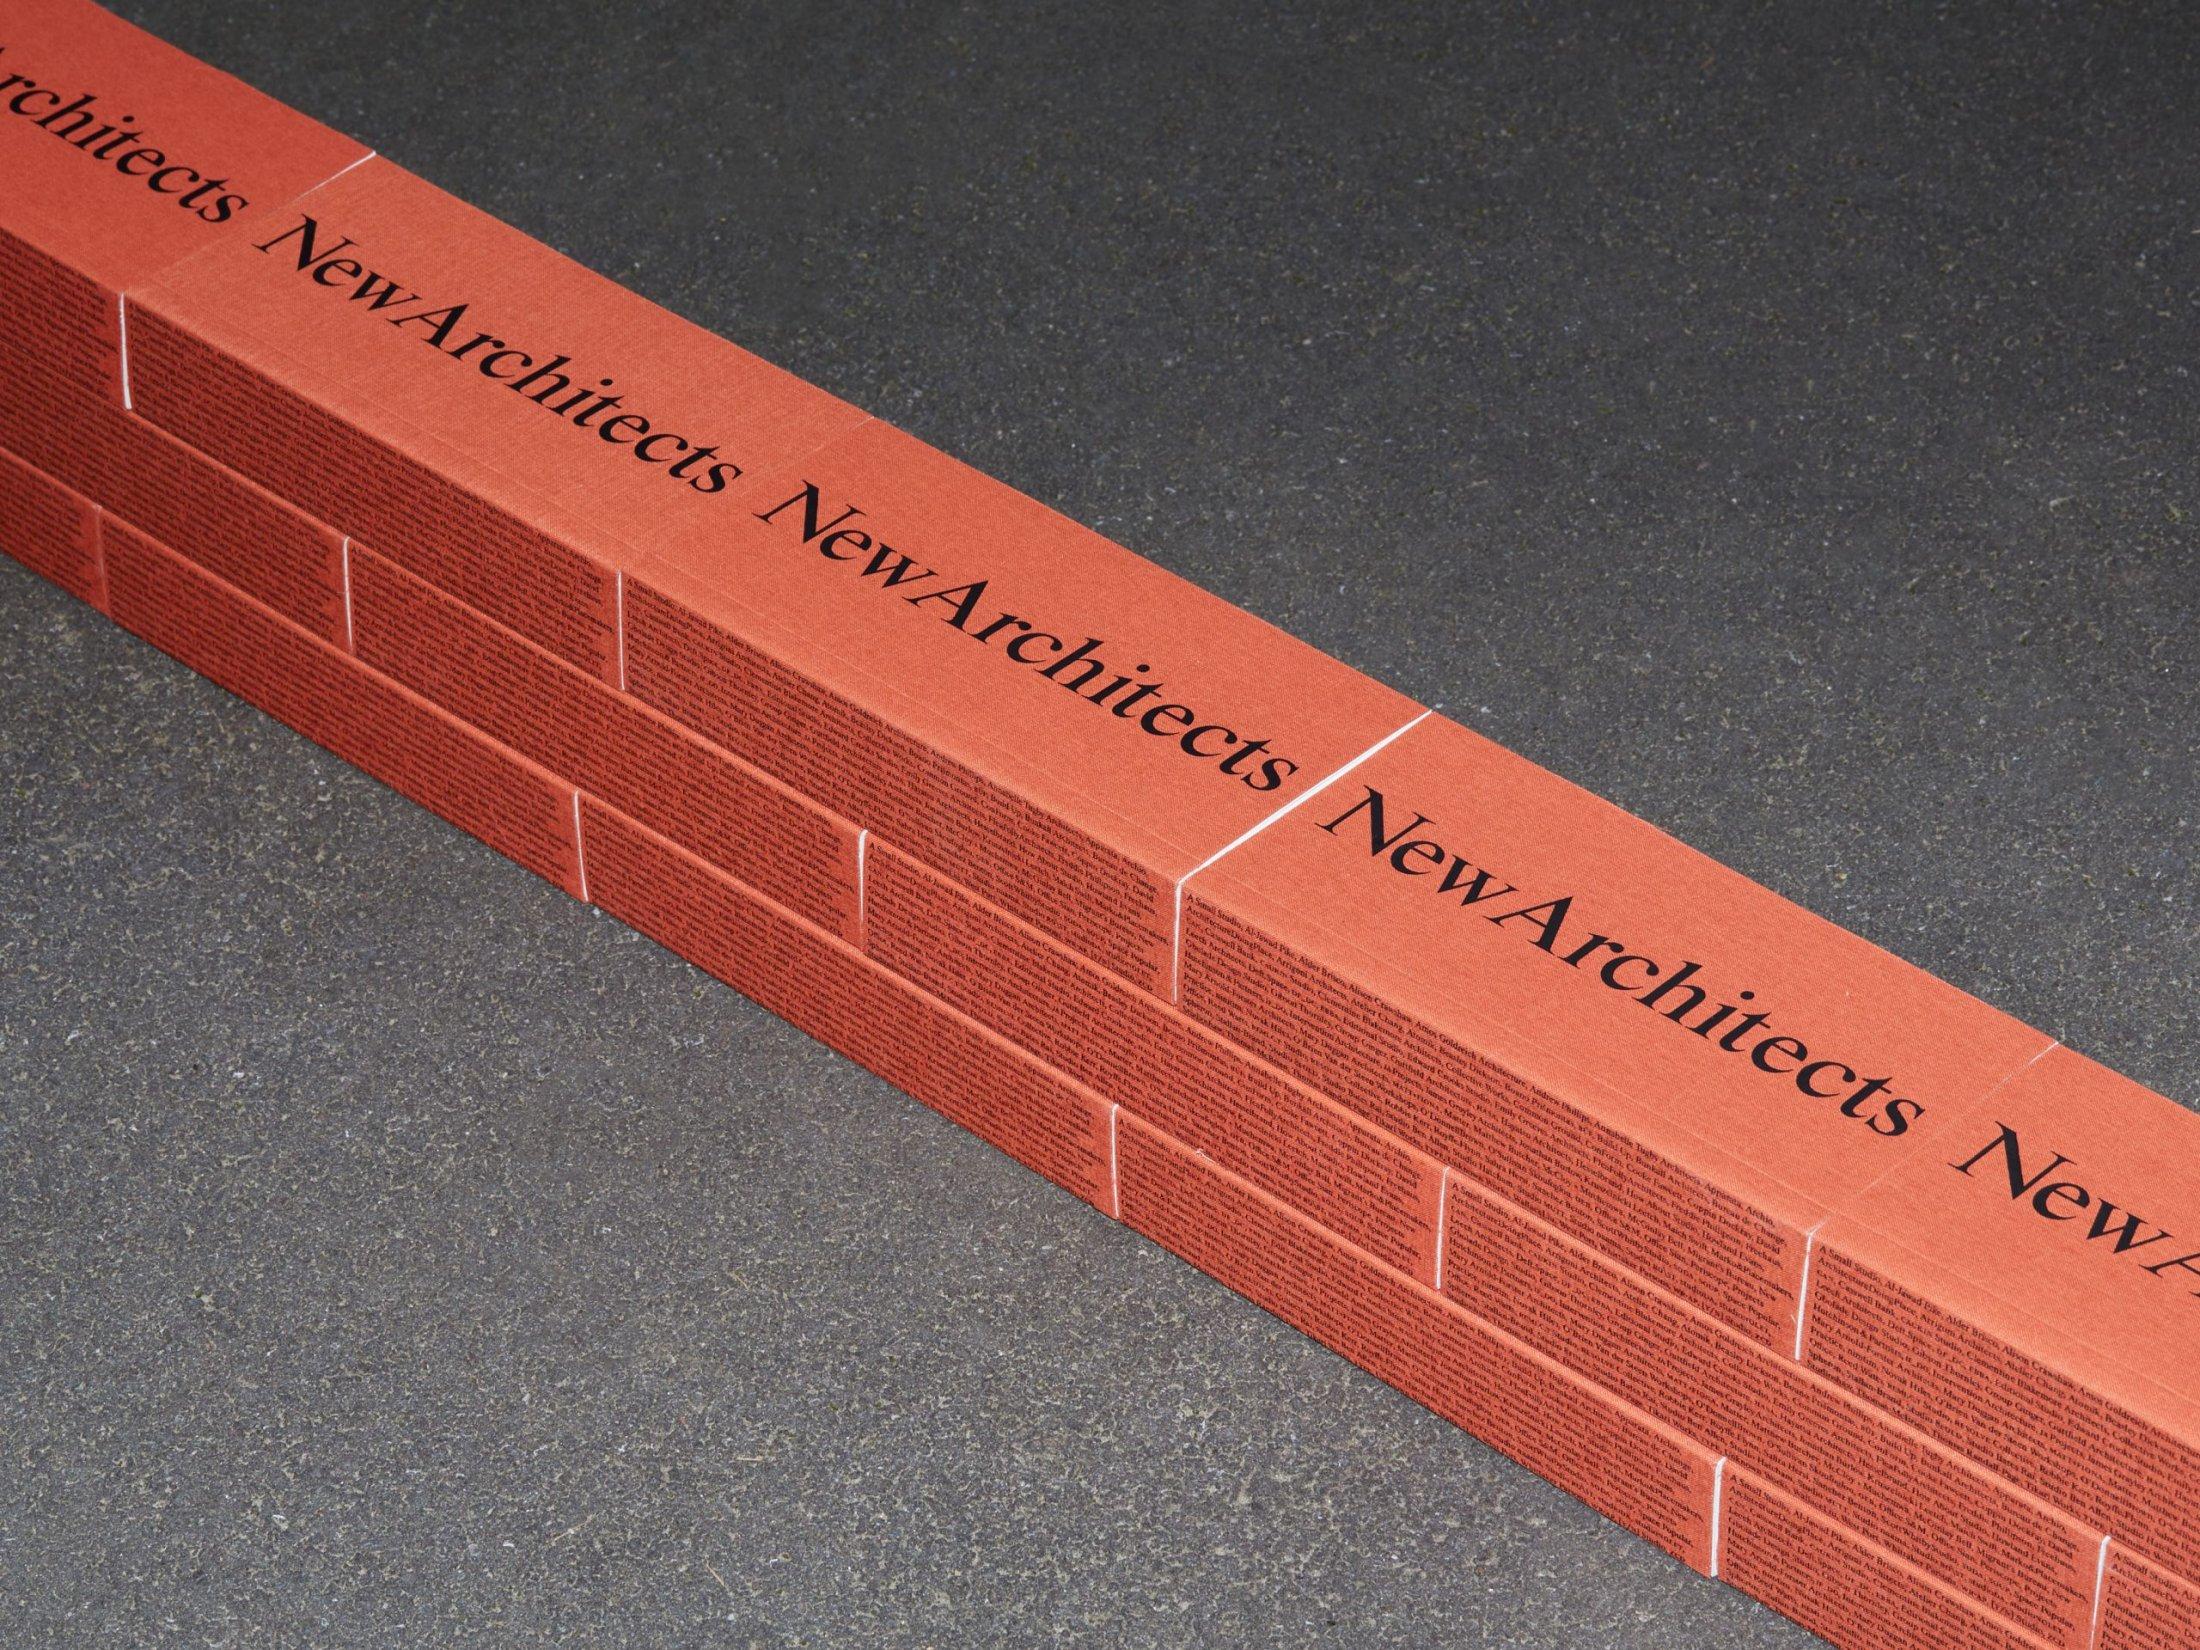 Architecture Foundation, New Architects 4